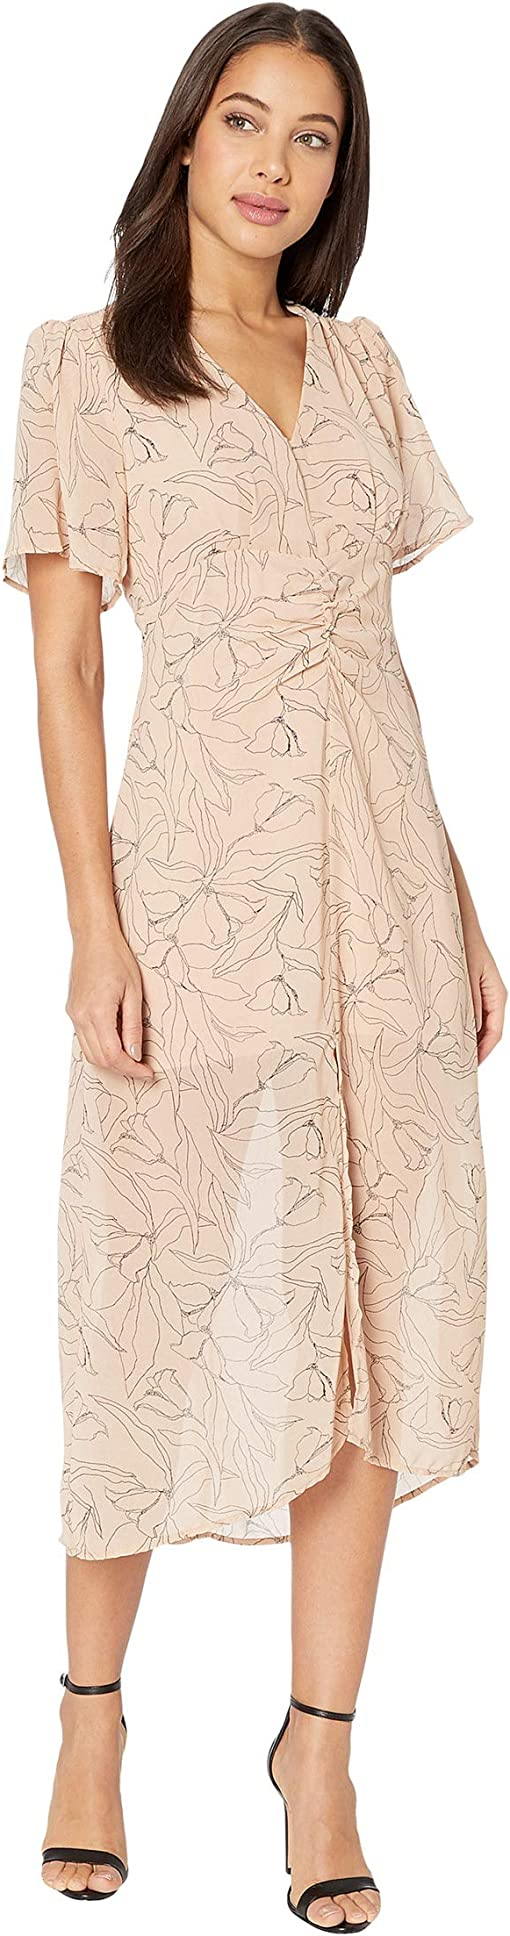 Apricot/Black Sketch Floral